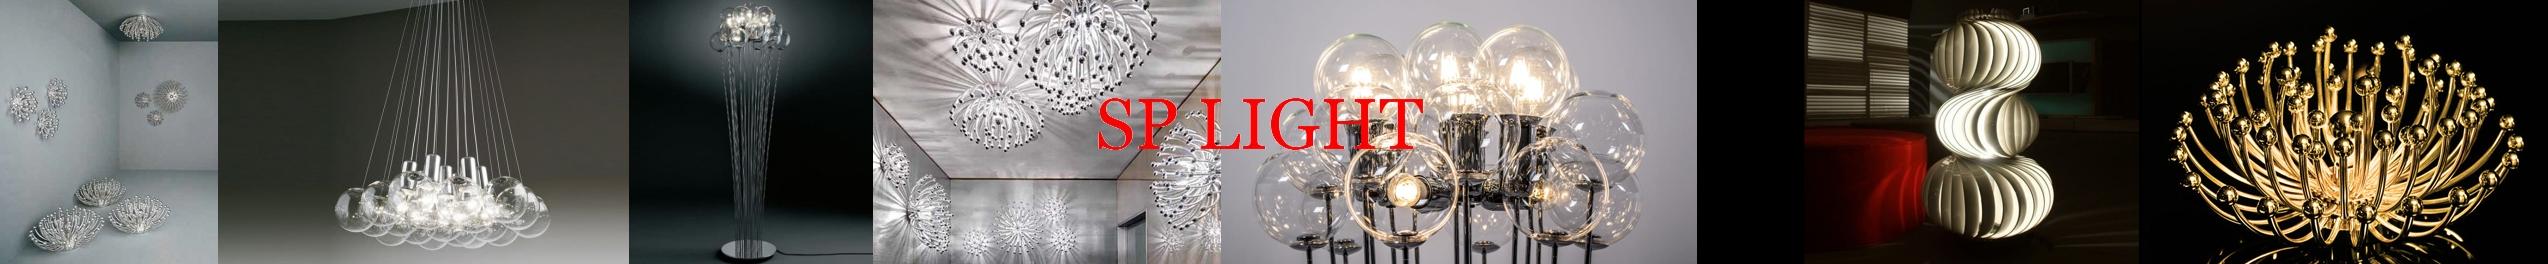 SP-LIGHT